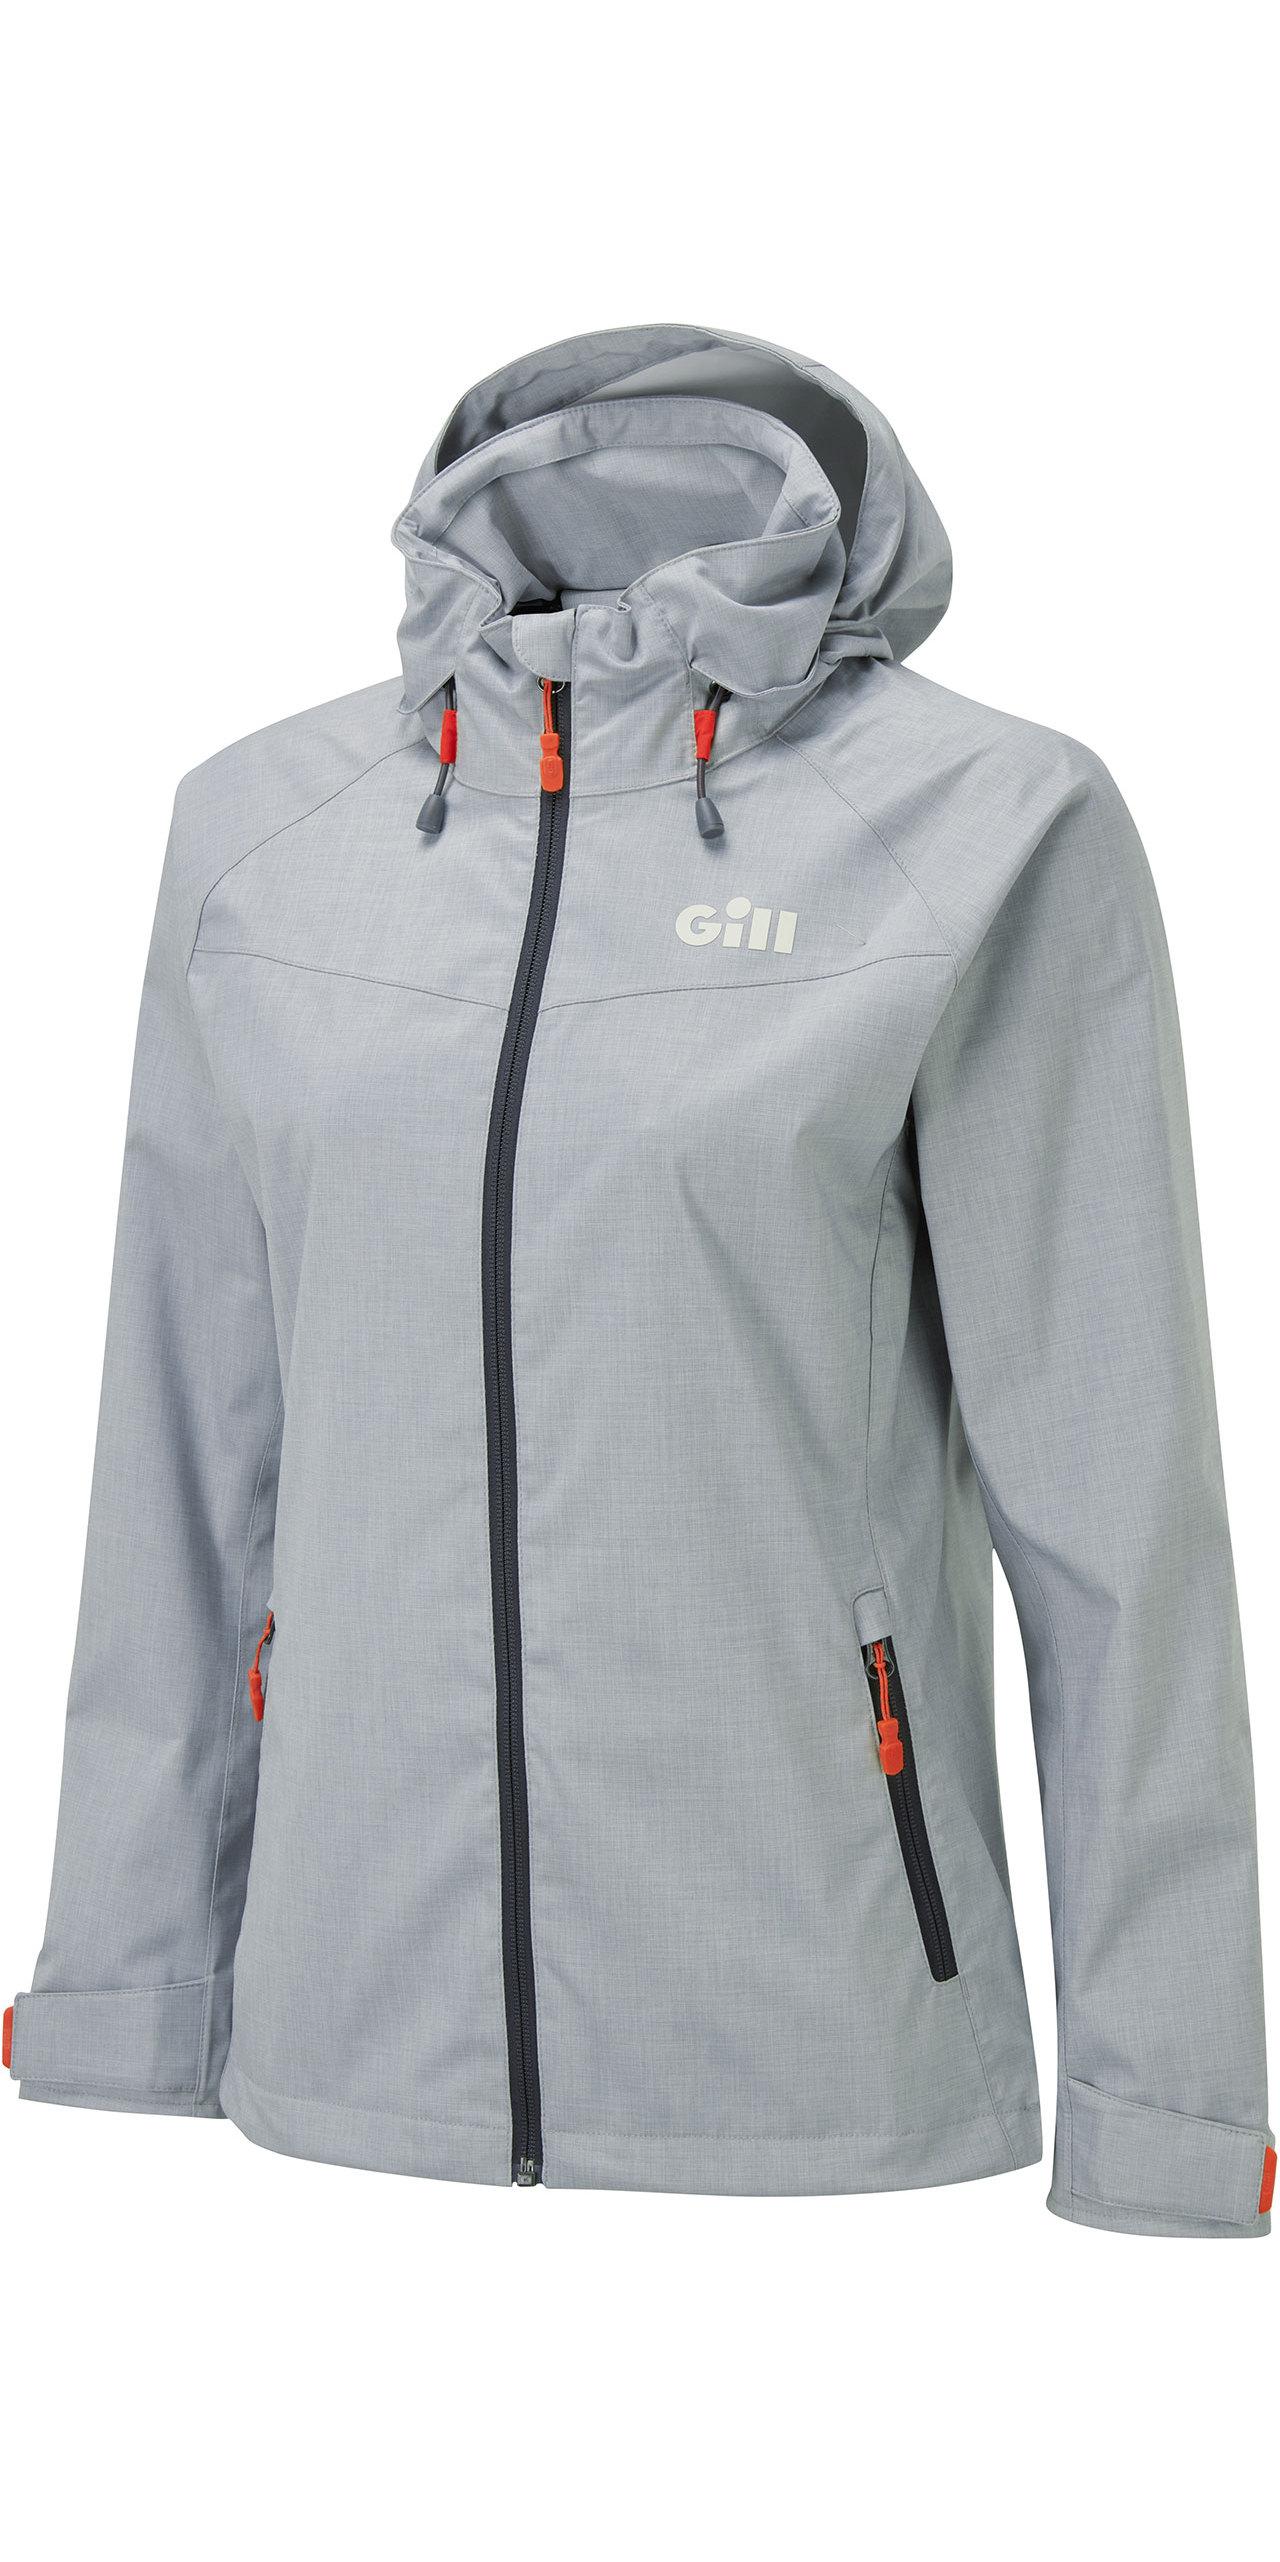 2020 Gill Womens Pilot Jacket IN81JW - Graphite Melange